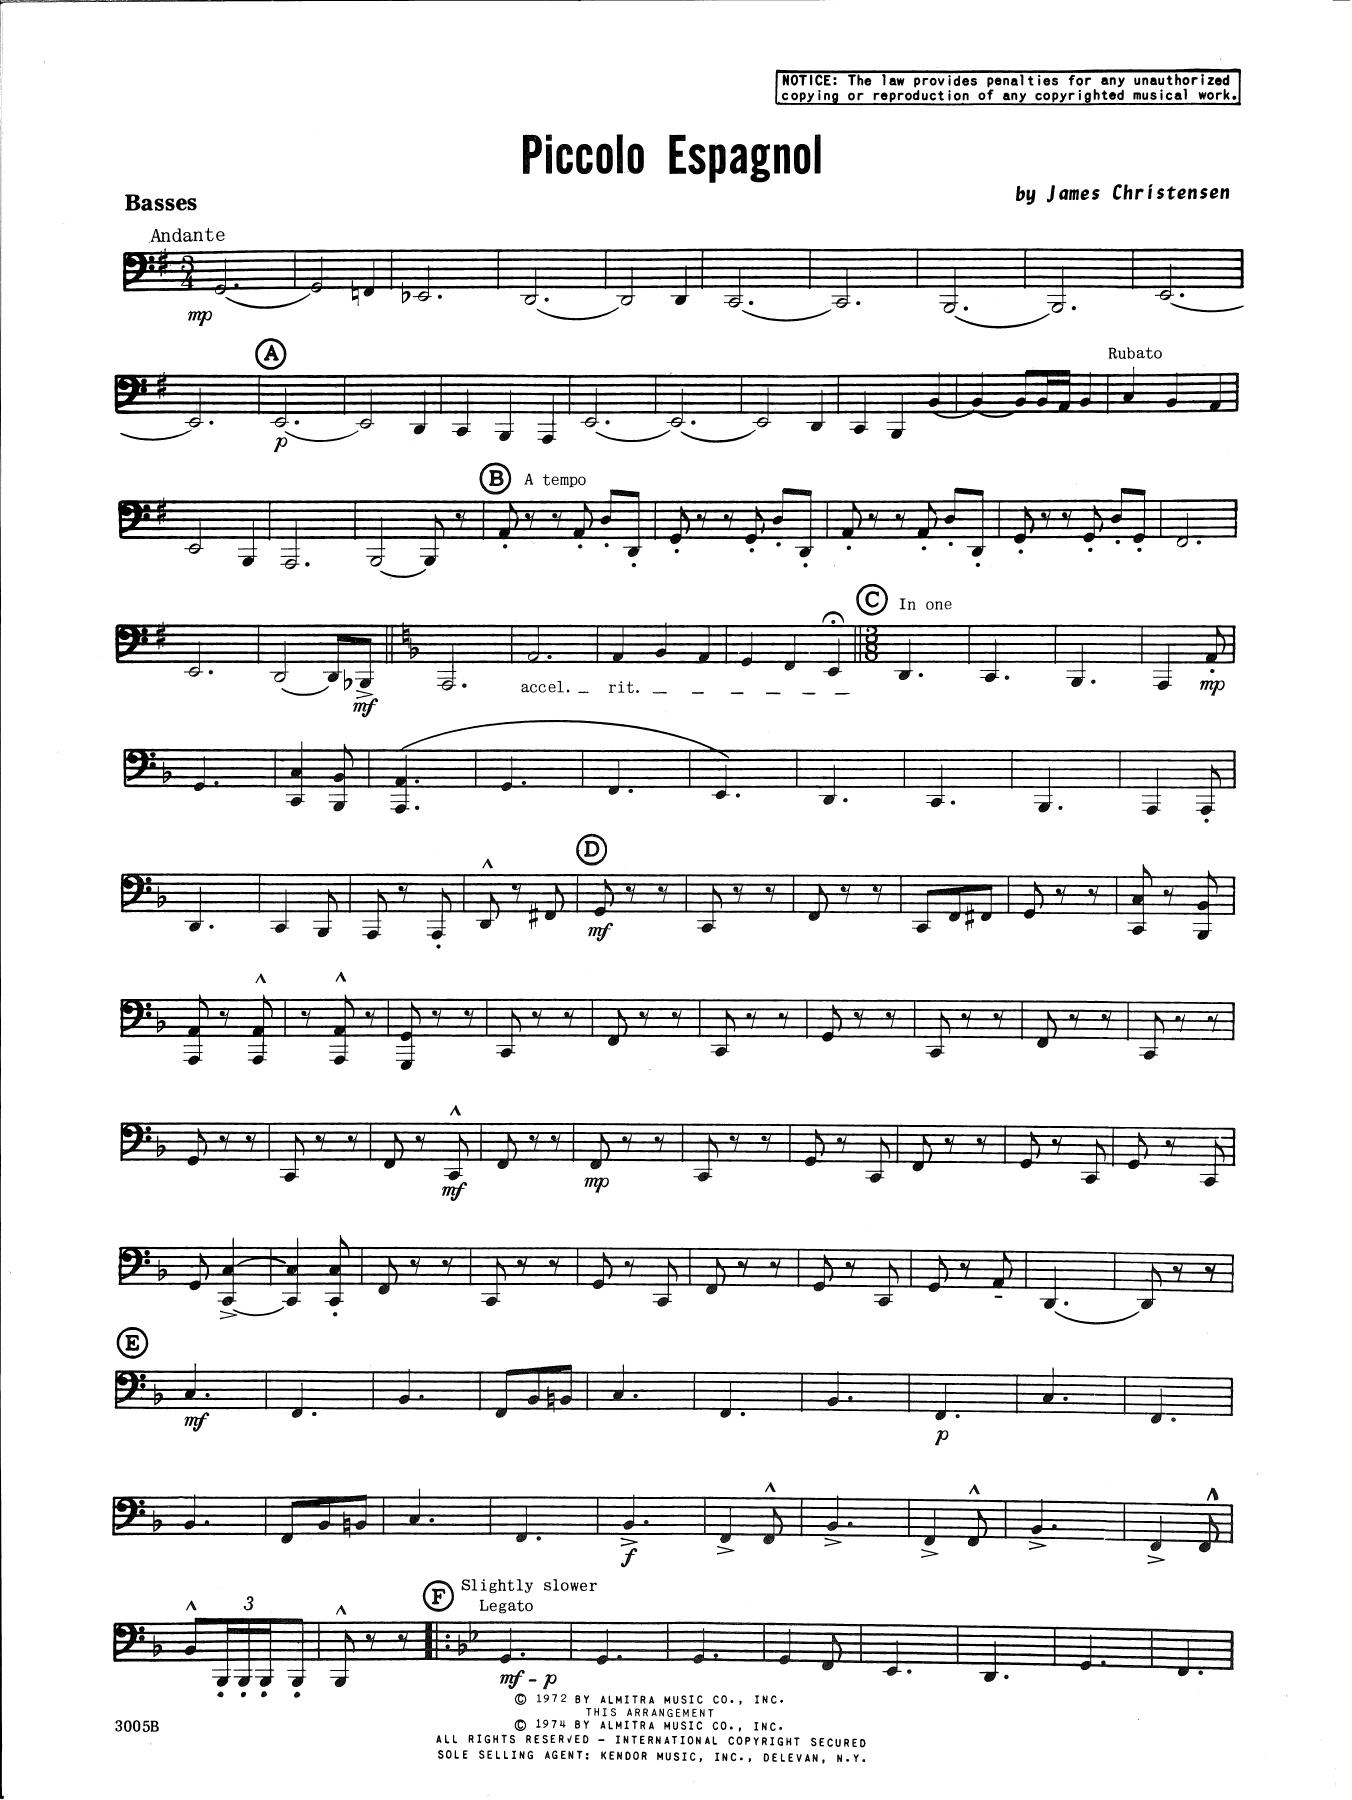 James Christensen Piccolo Espagnol - Tuba sheet music notes and chords. Download Printable PDF.